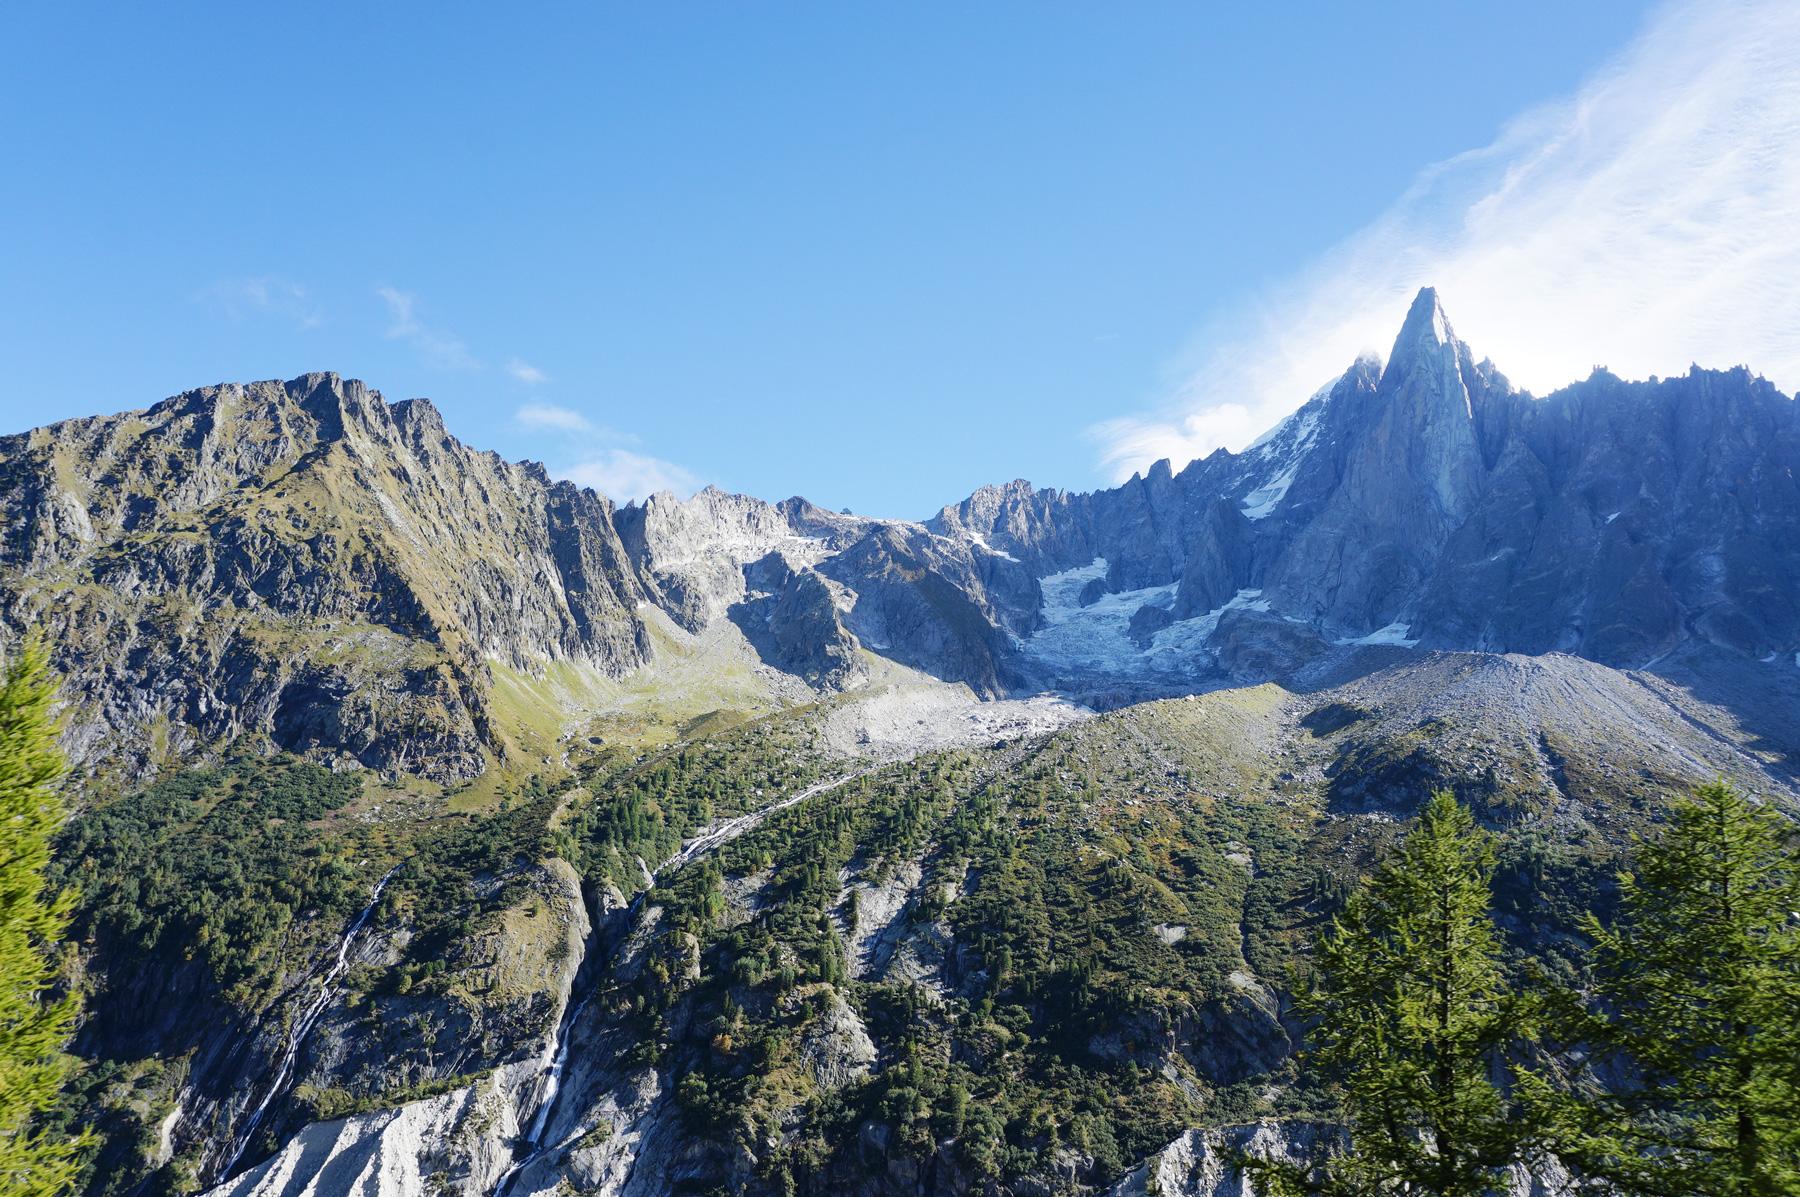 La mer de glace - Chamonix Montenvers